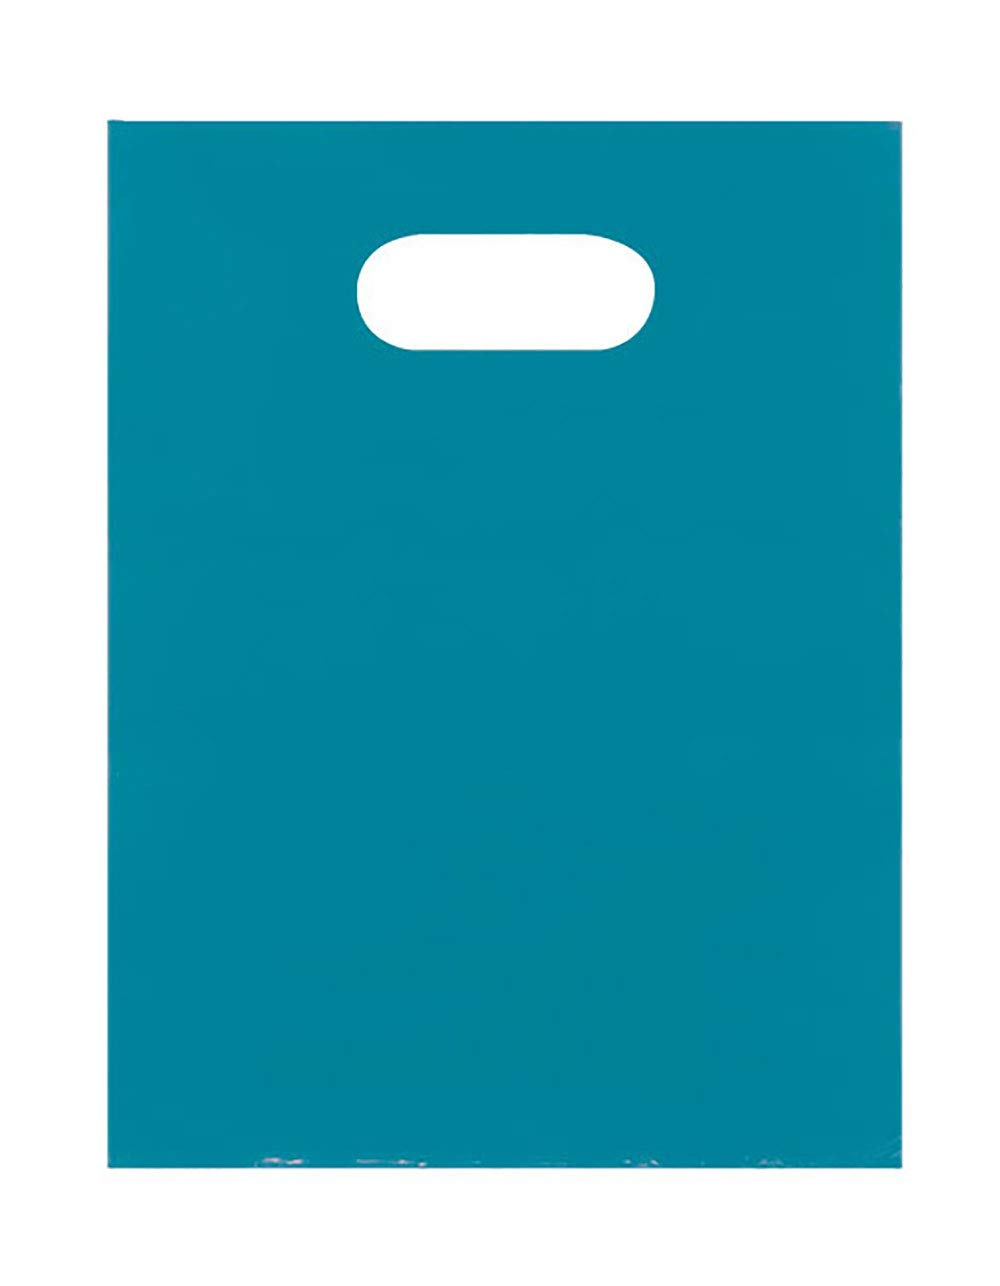 Teal Blue Merchandise Bags - Lightweight (9x12) - Pack of 1,000